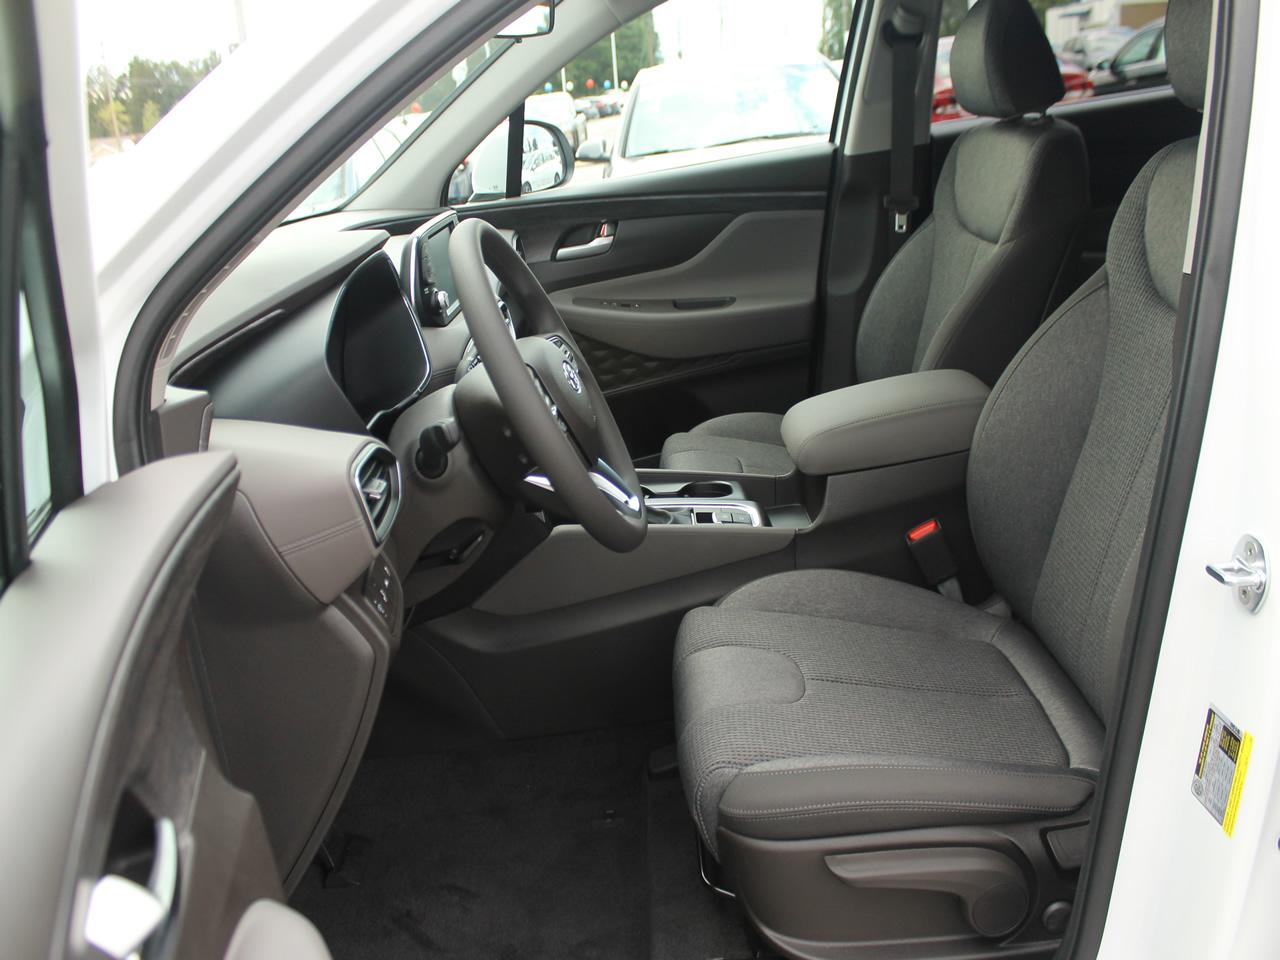 Dick Smith Hyundai >> NEW 2019 HYUNDAI SANTA FE SE 2.4 VIN 5NMS23AD5KH014999 - Hyundai in Greenville | Hyundai ...